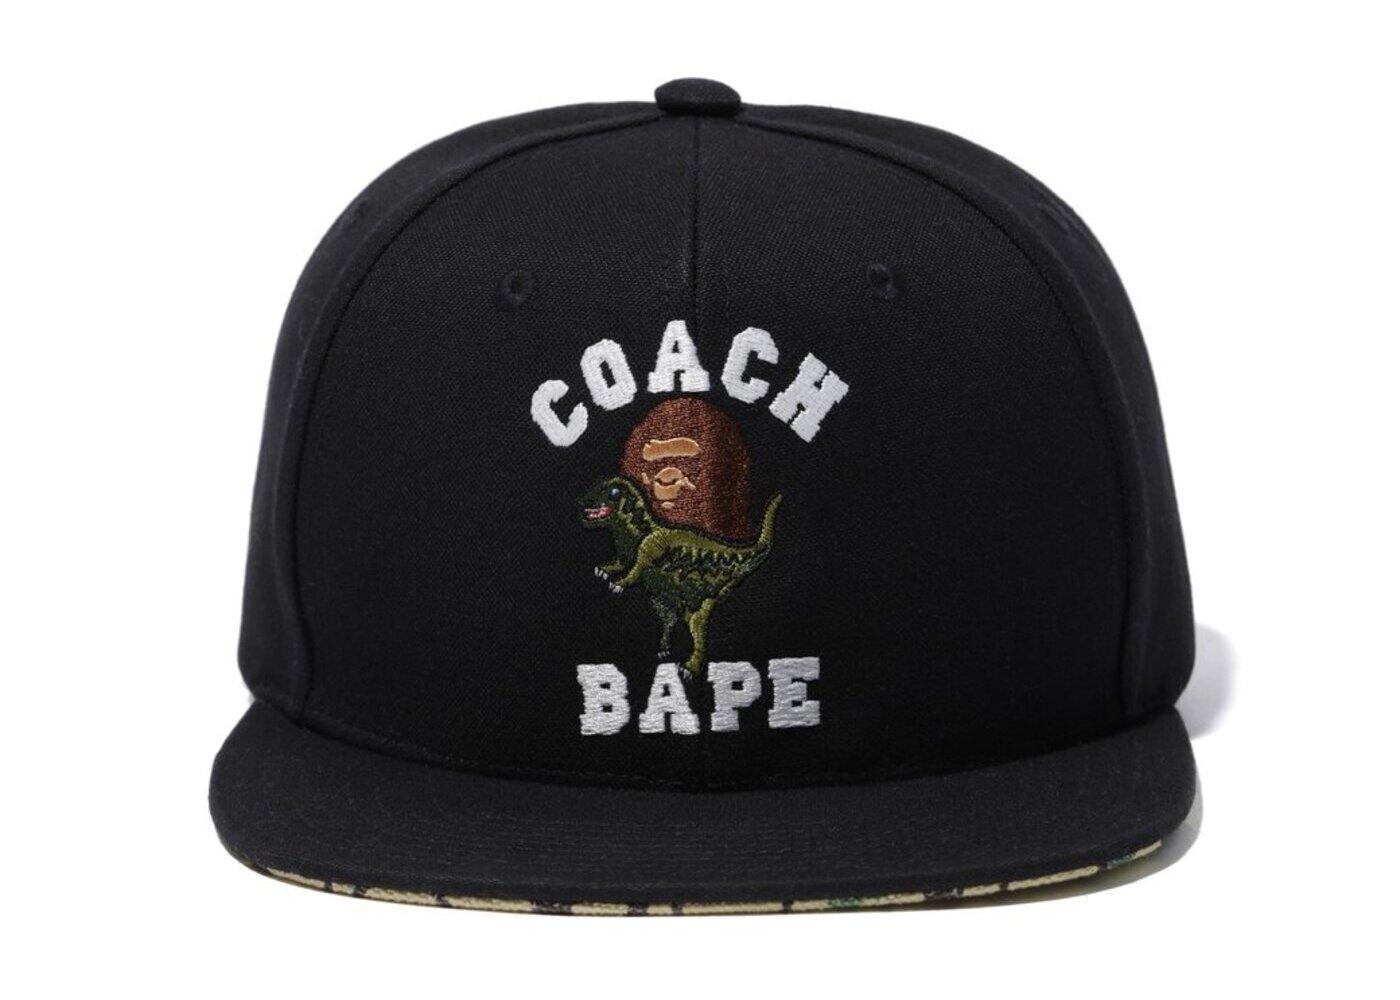 Bape x Coach Baseball Cap Black (SS20)の写真